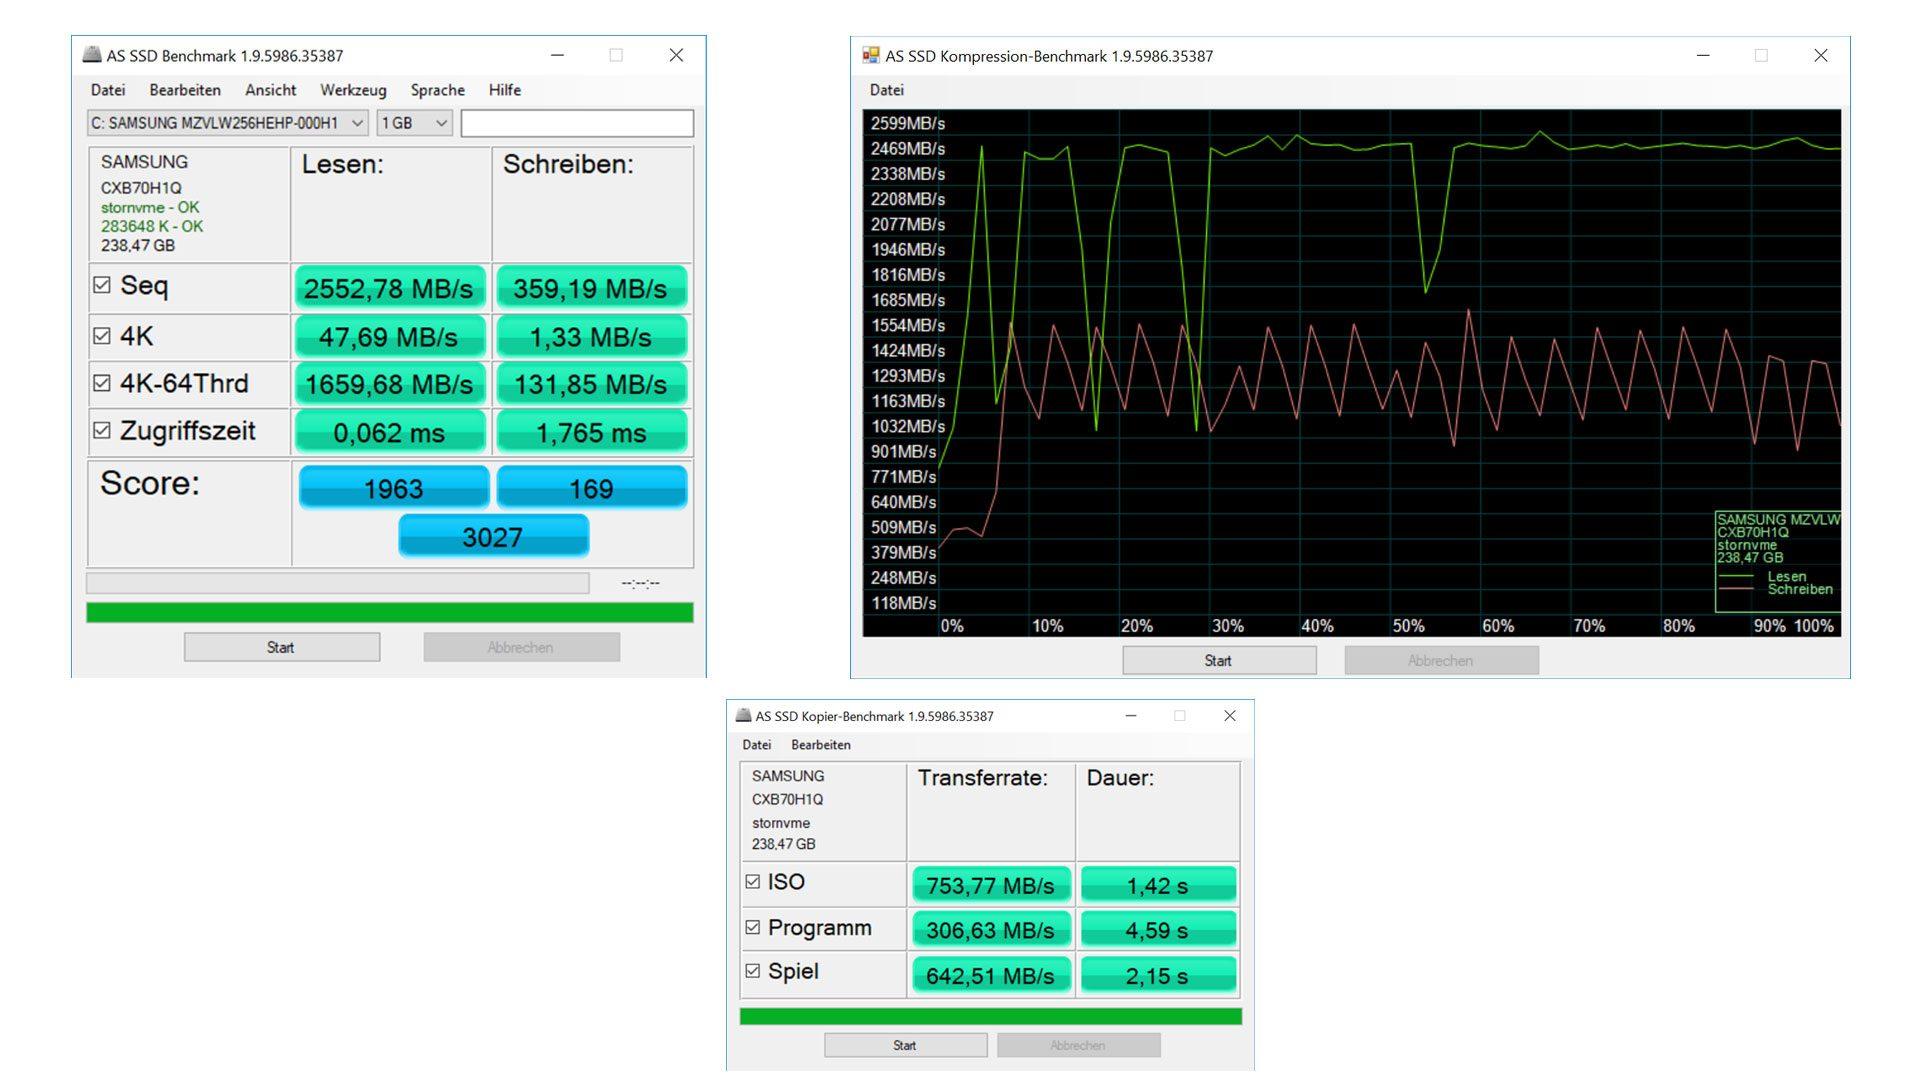 HP-Spectre-x360-13-ac000ng_Benchmark-5